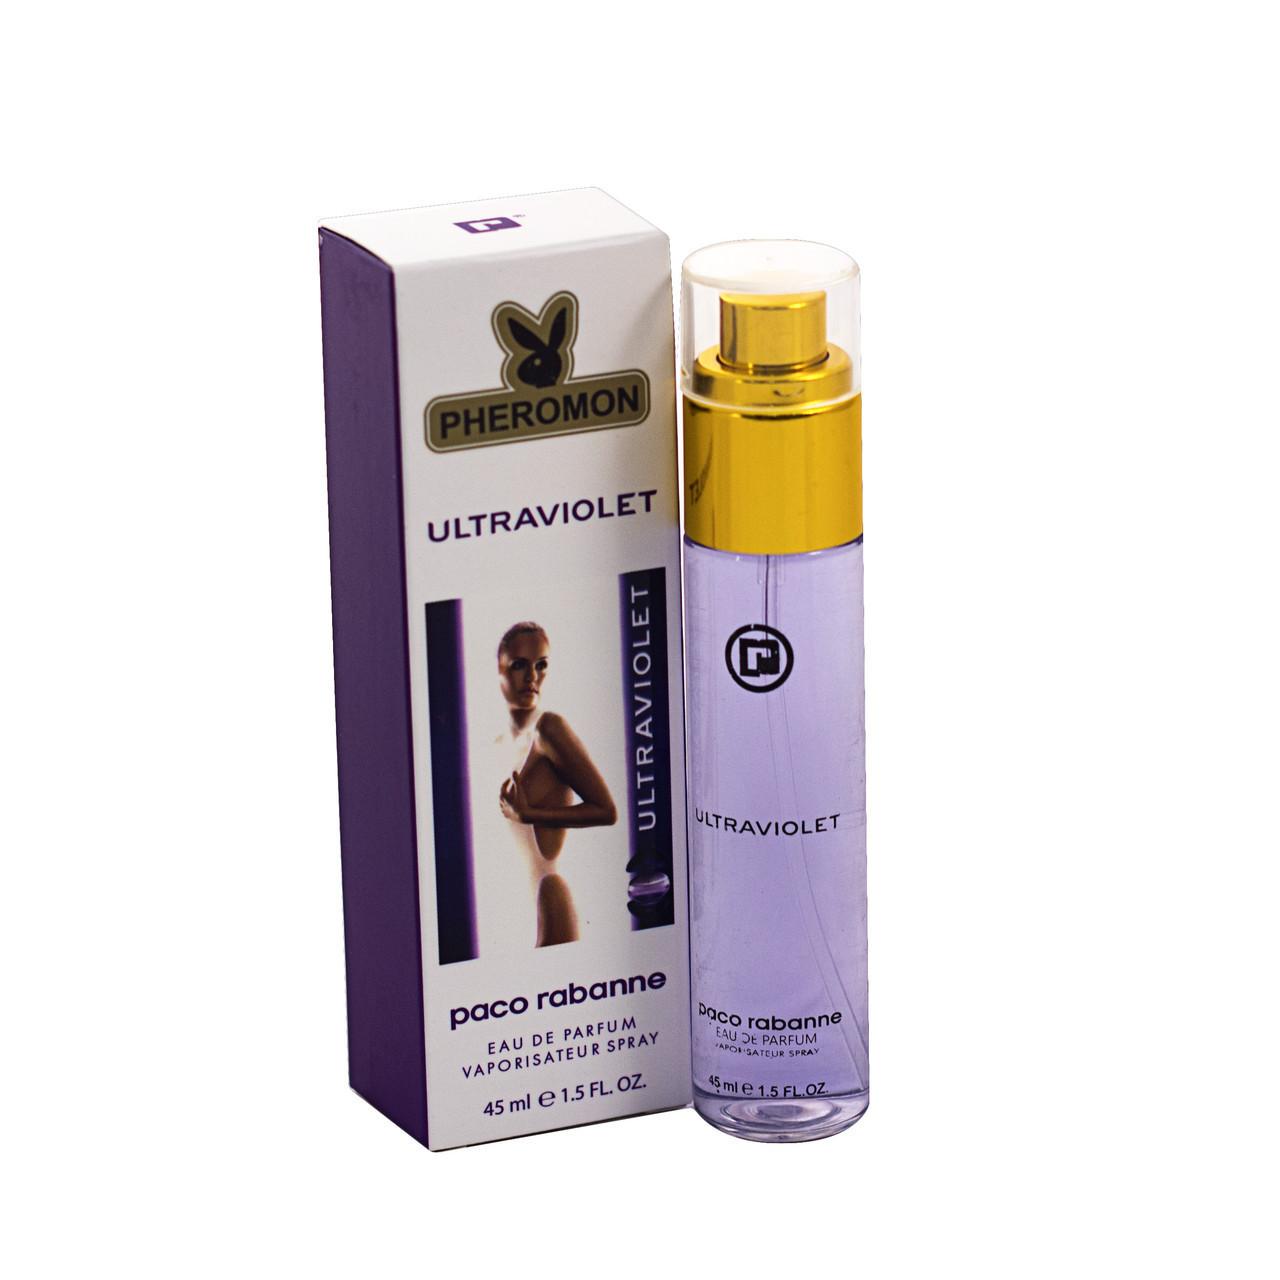 Paco Rabanne Ultraviolet pour femme edp - Pheromone Tube 45 ml реплика